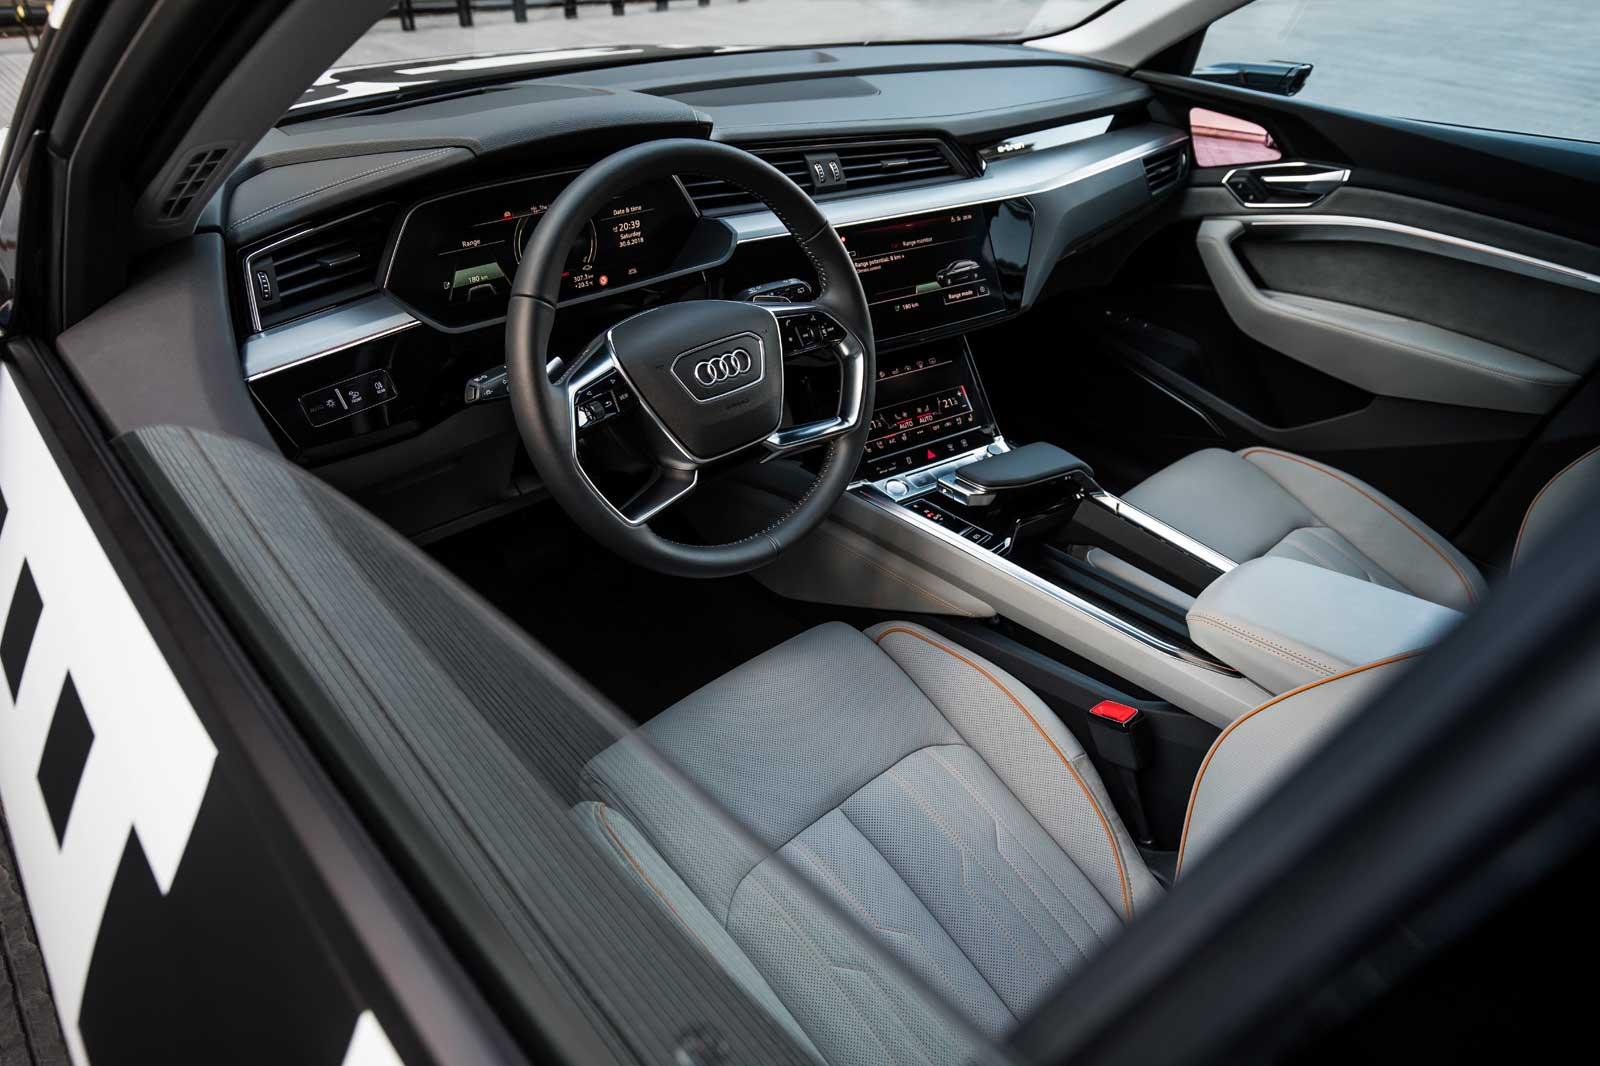 Audi E Tron Quattro 2018 >> 來看看 Audi e-tron Quattro 原型車是怎麼用相機取代後視鏡的